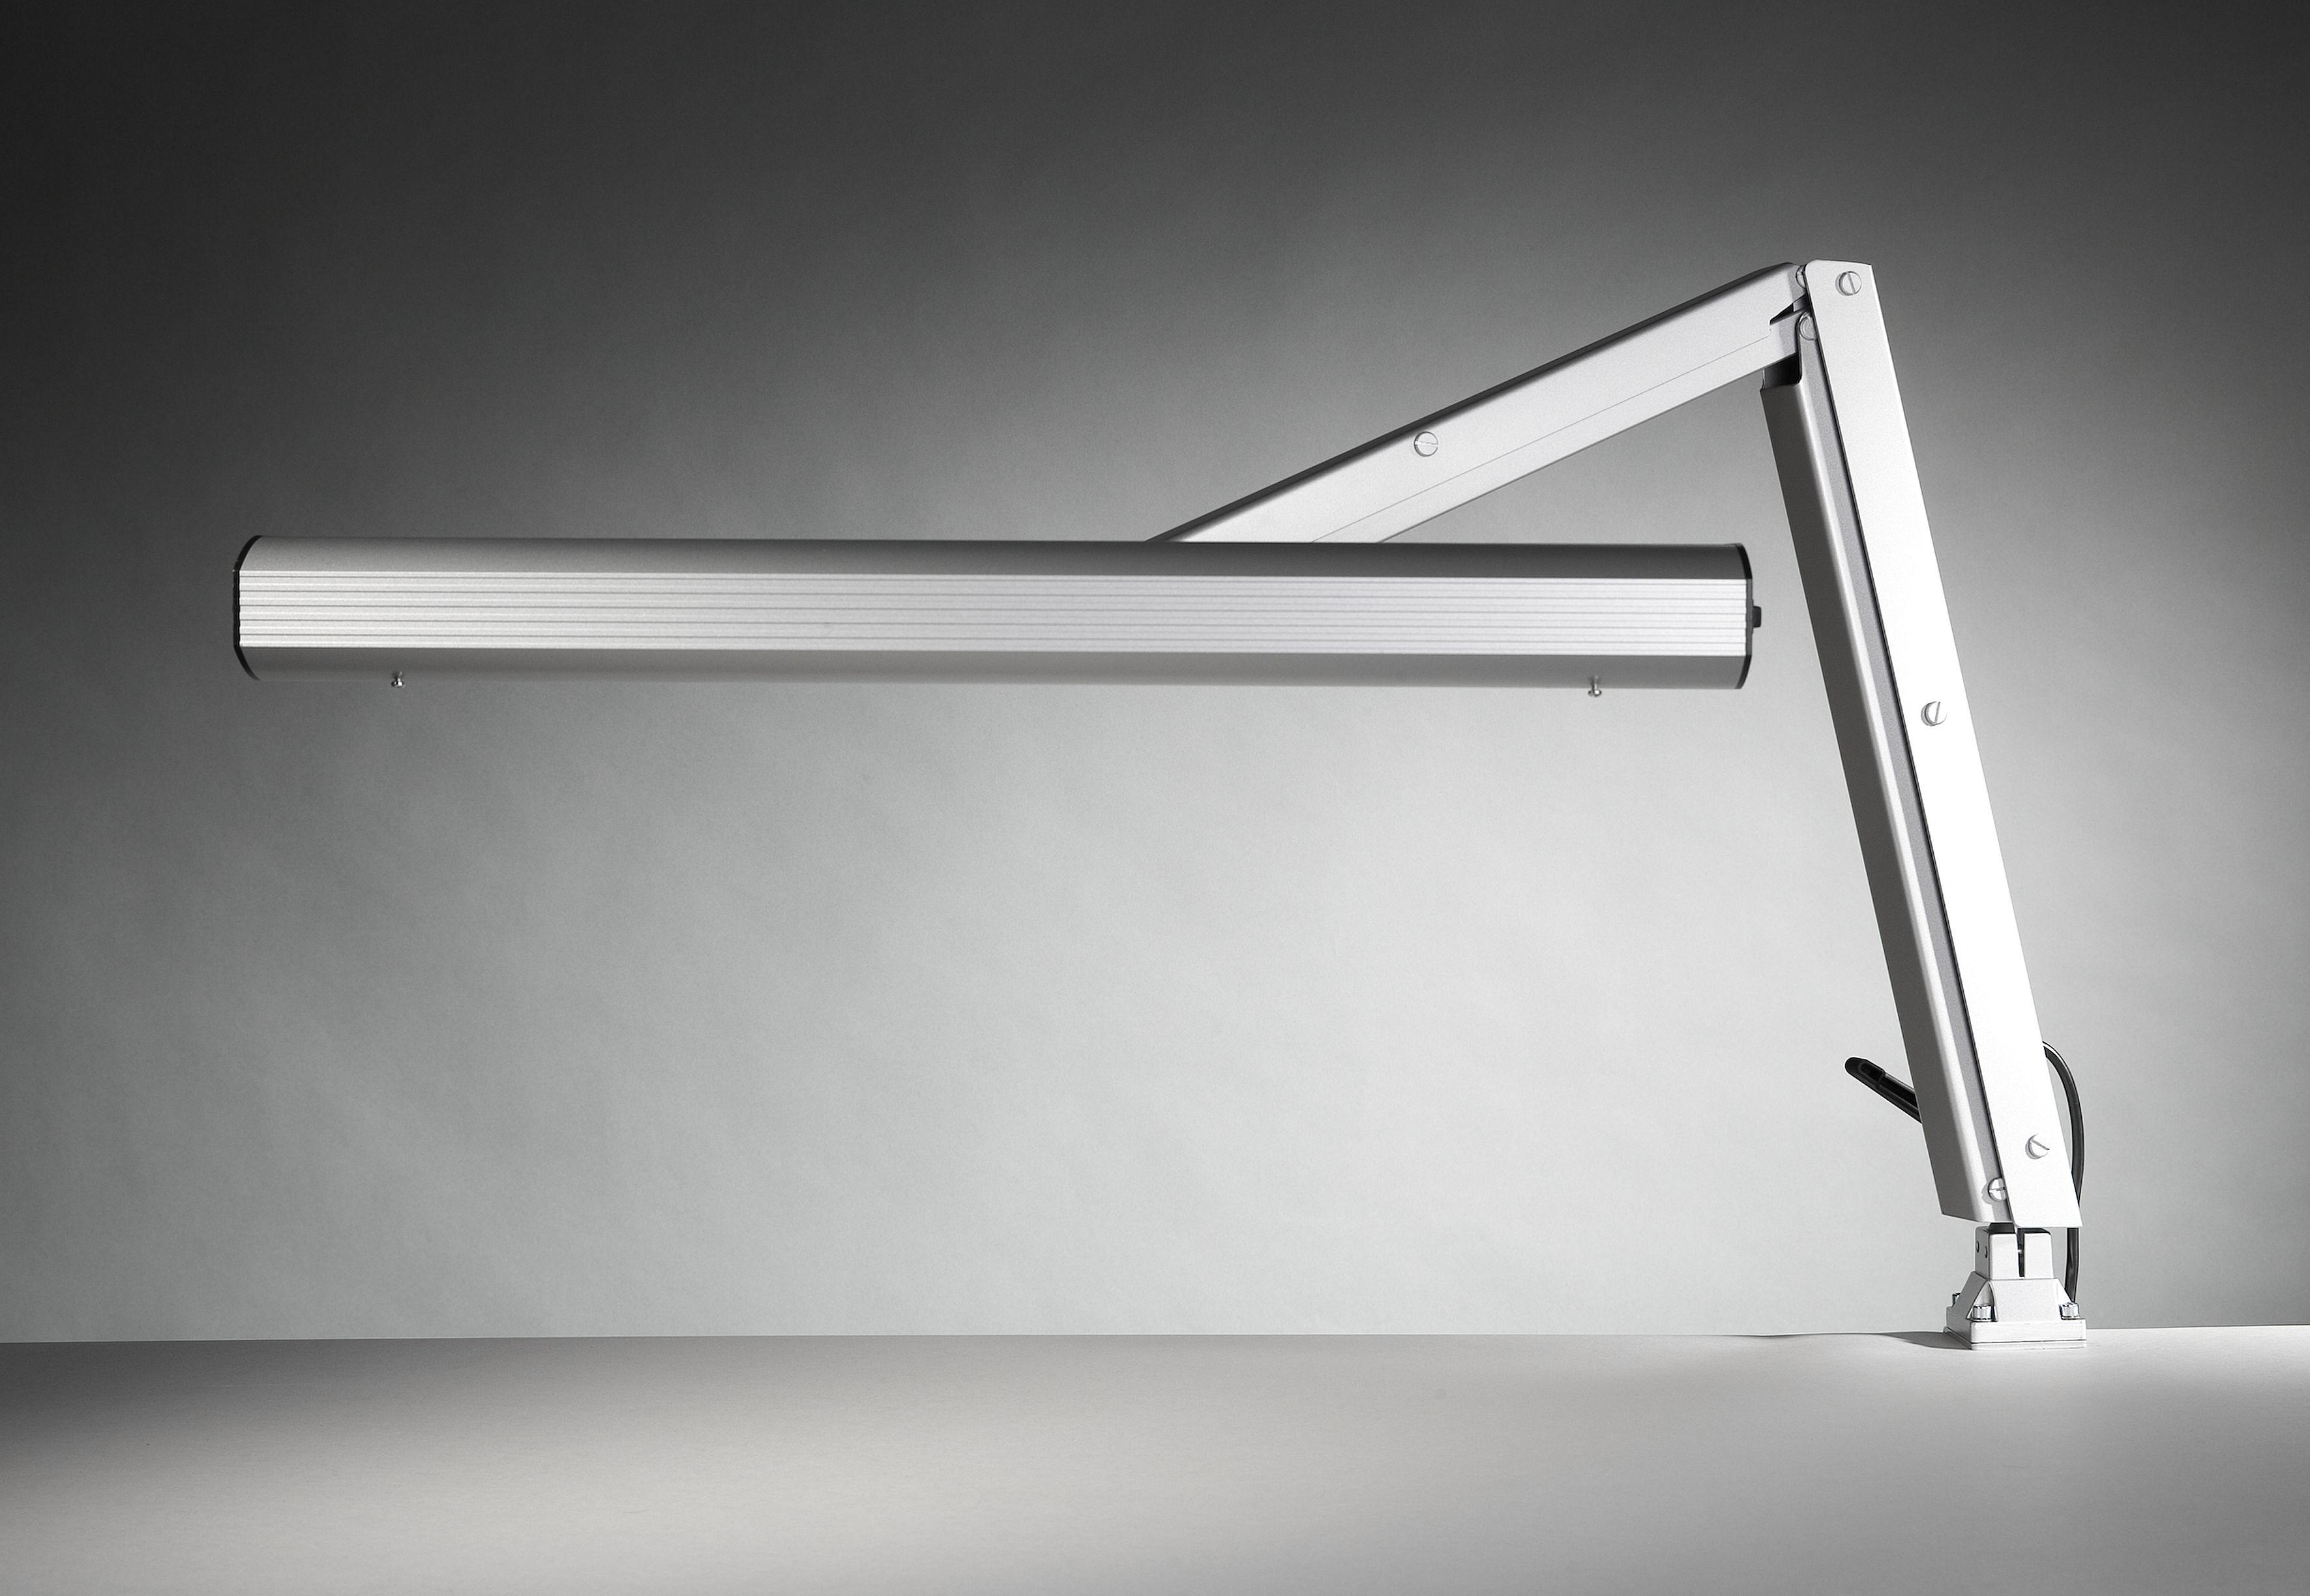 LED Gelenkleuchte SLLED II 24 W - neu